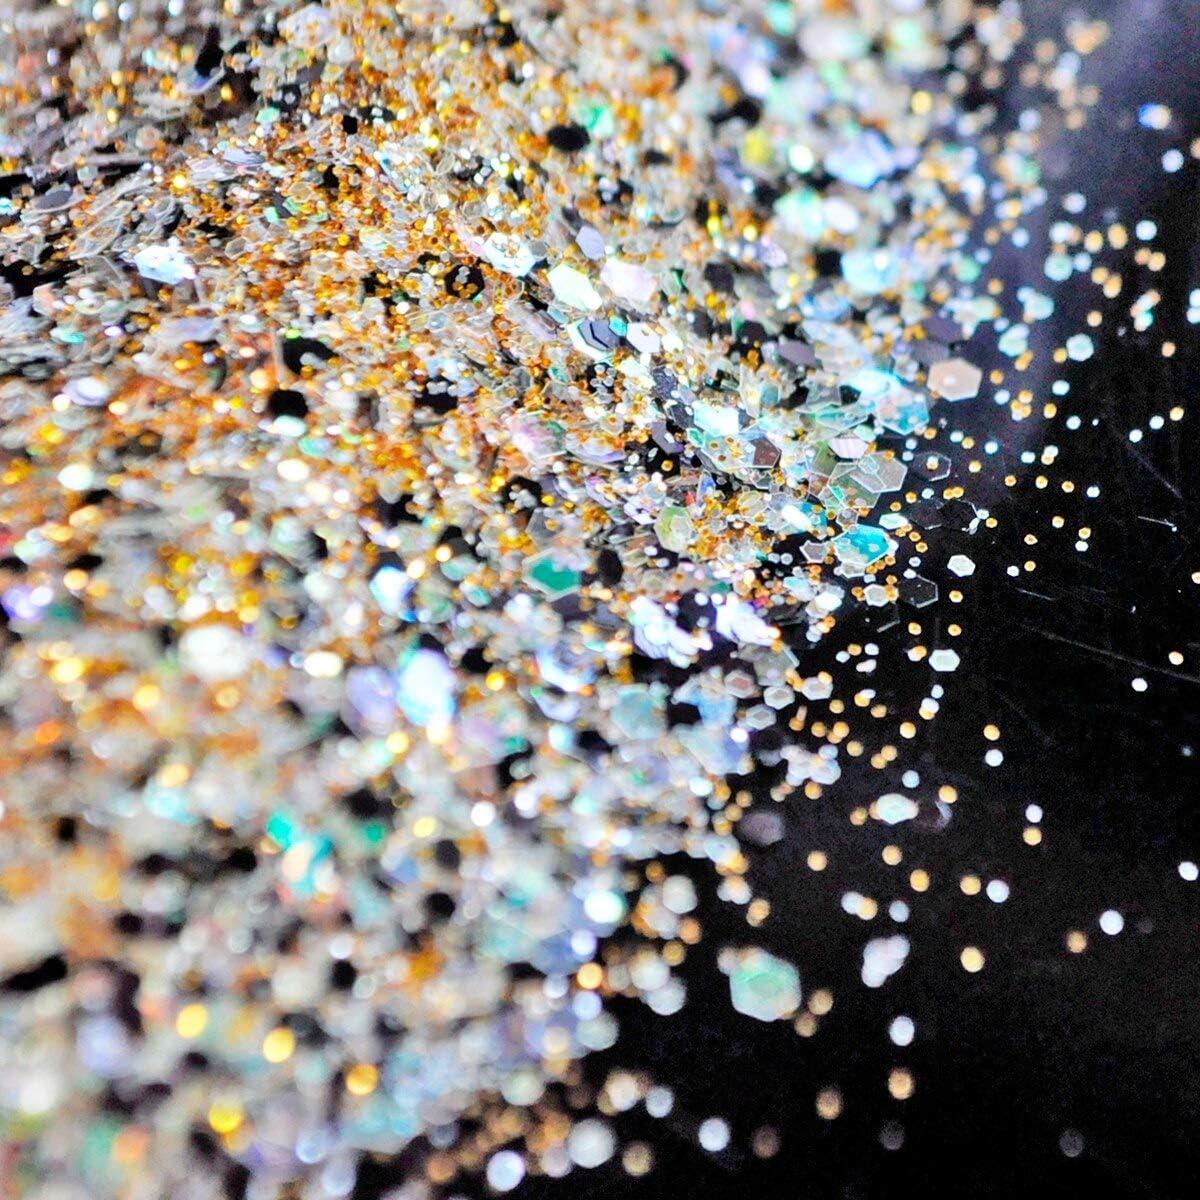 Gabcus supreme Clear Max 53% OFF Gold Black Glitter Size Mix Nail Art Powder